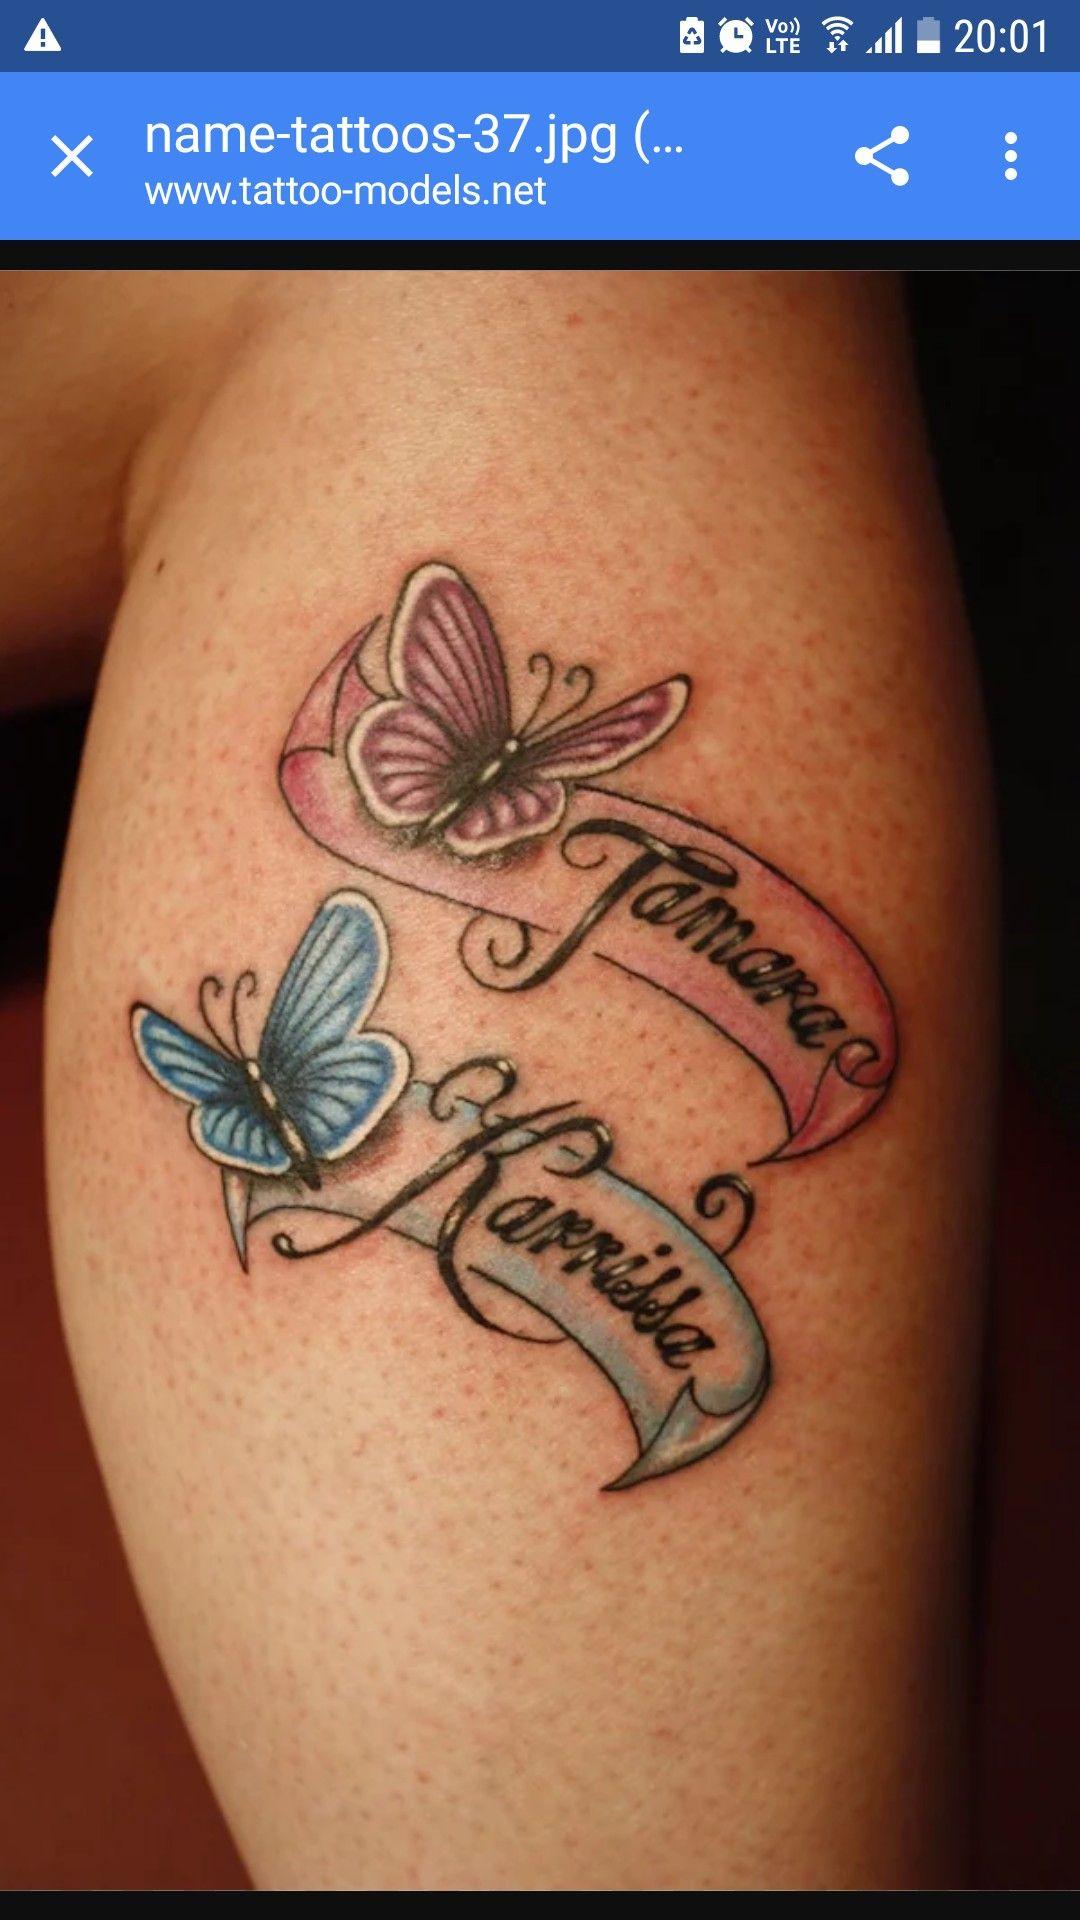 Farfalle con nomi